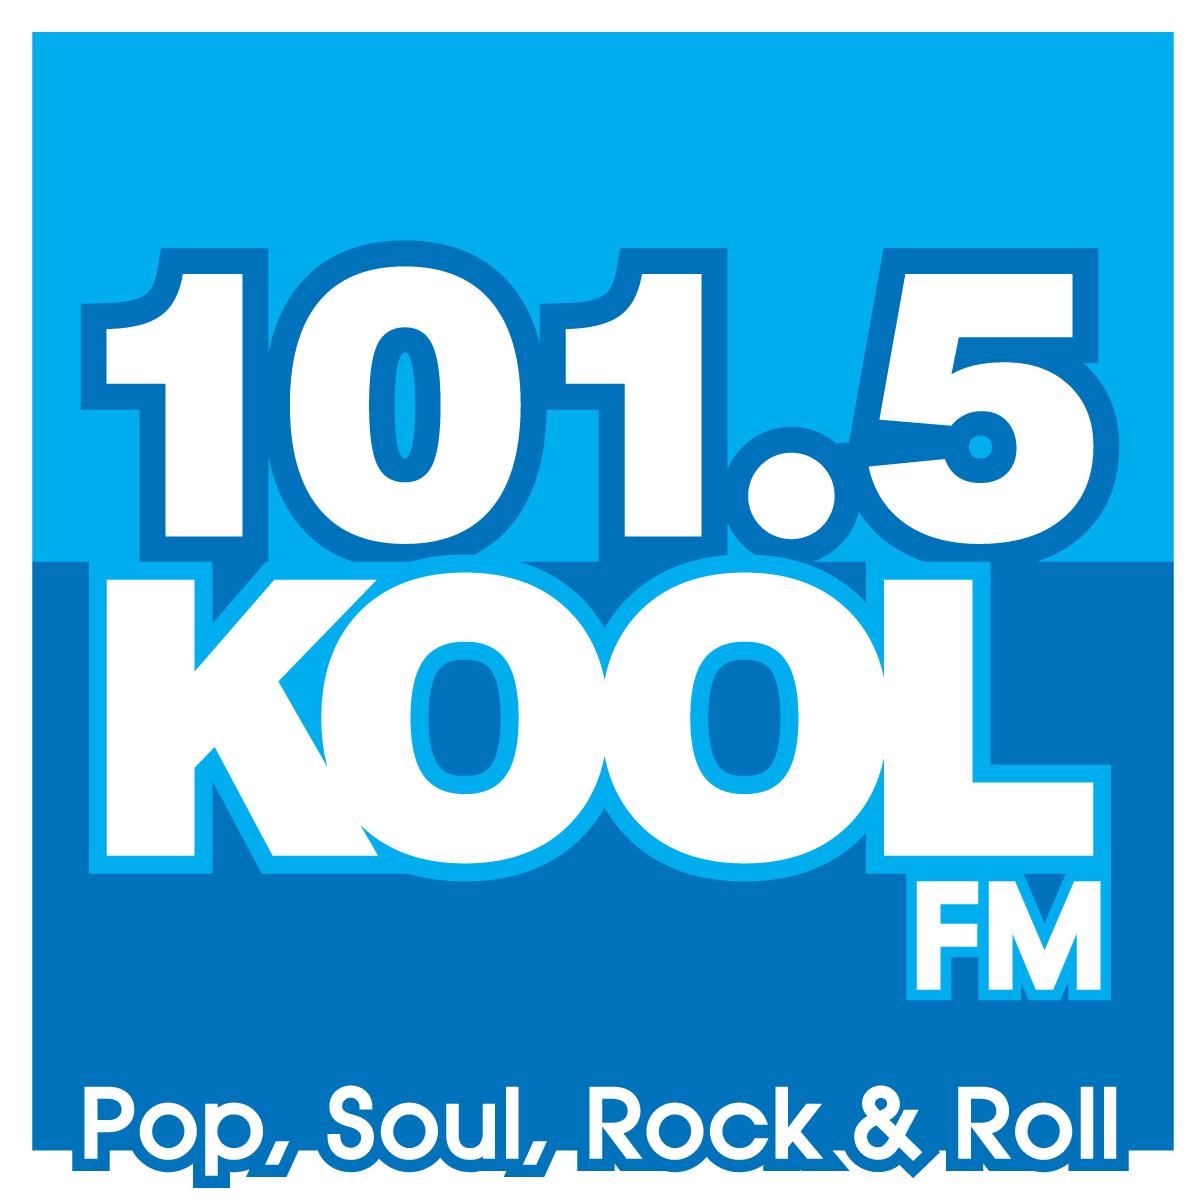 Kool-Logo-With-Tagline-hi-res.jpg